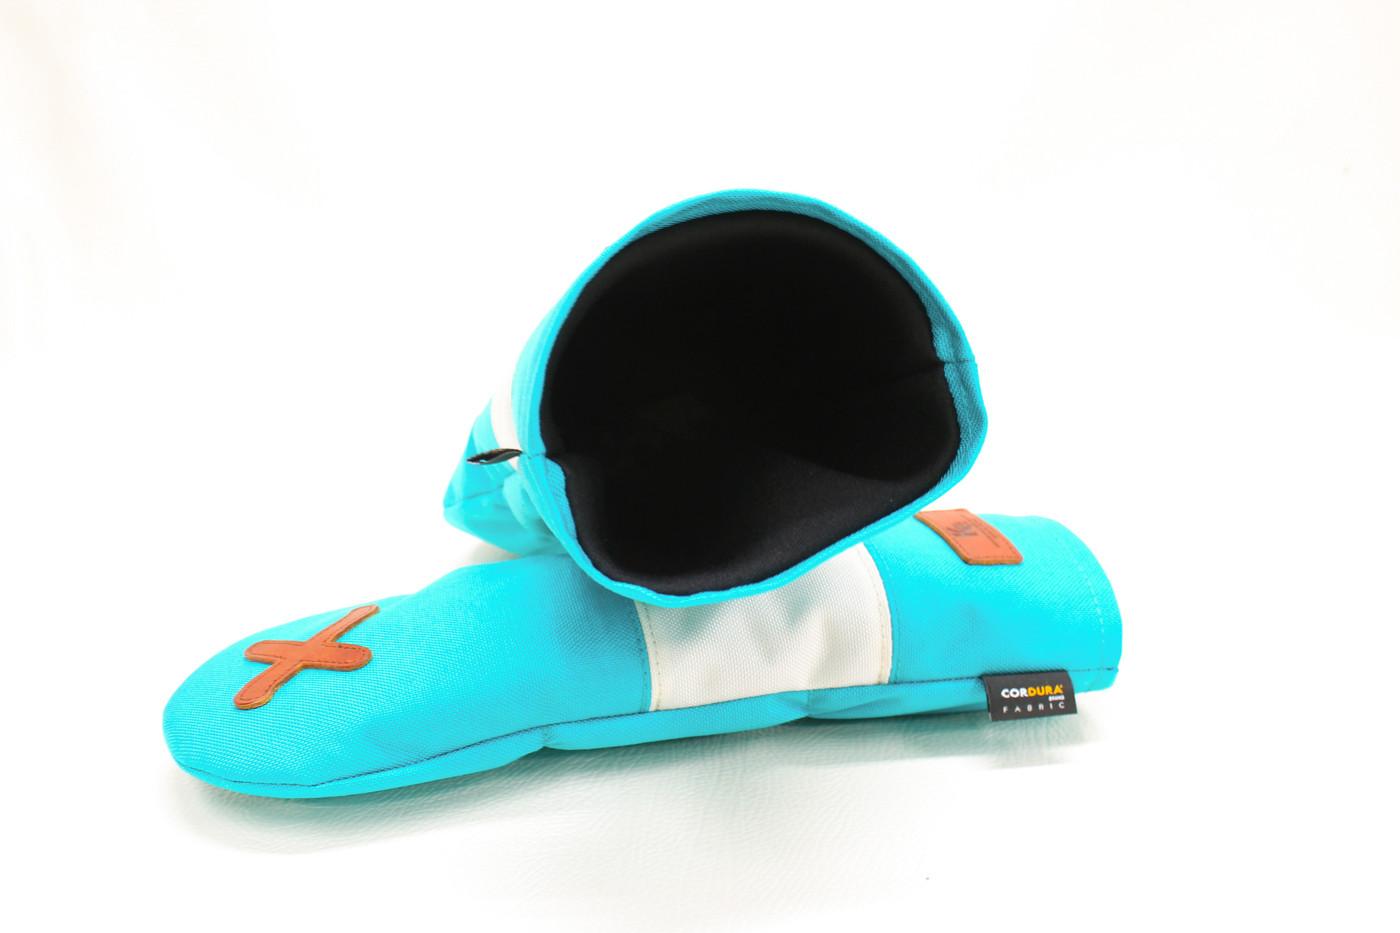 K& HC-Mit COBA ヘッドカバー ターコイズ、オフホワイト×fieno 内装